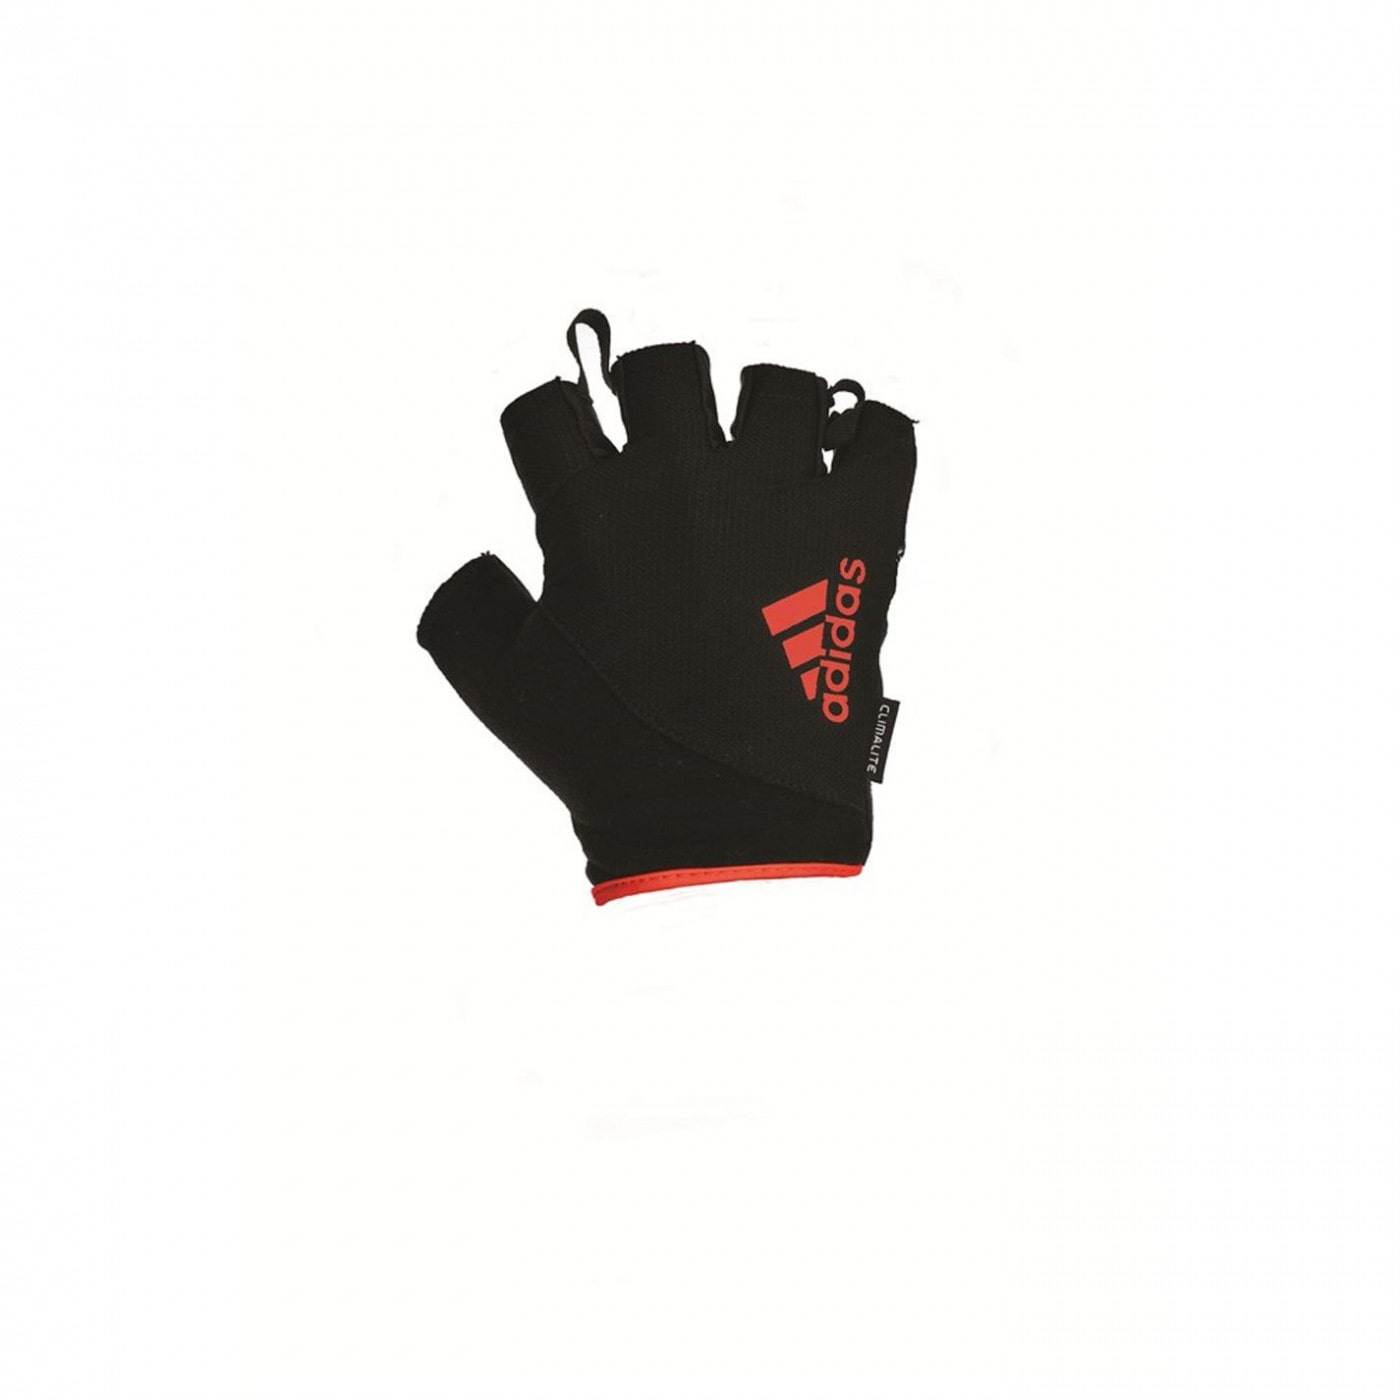 Adidas Fingerless Essential Gloves